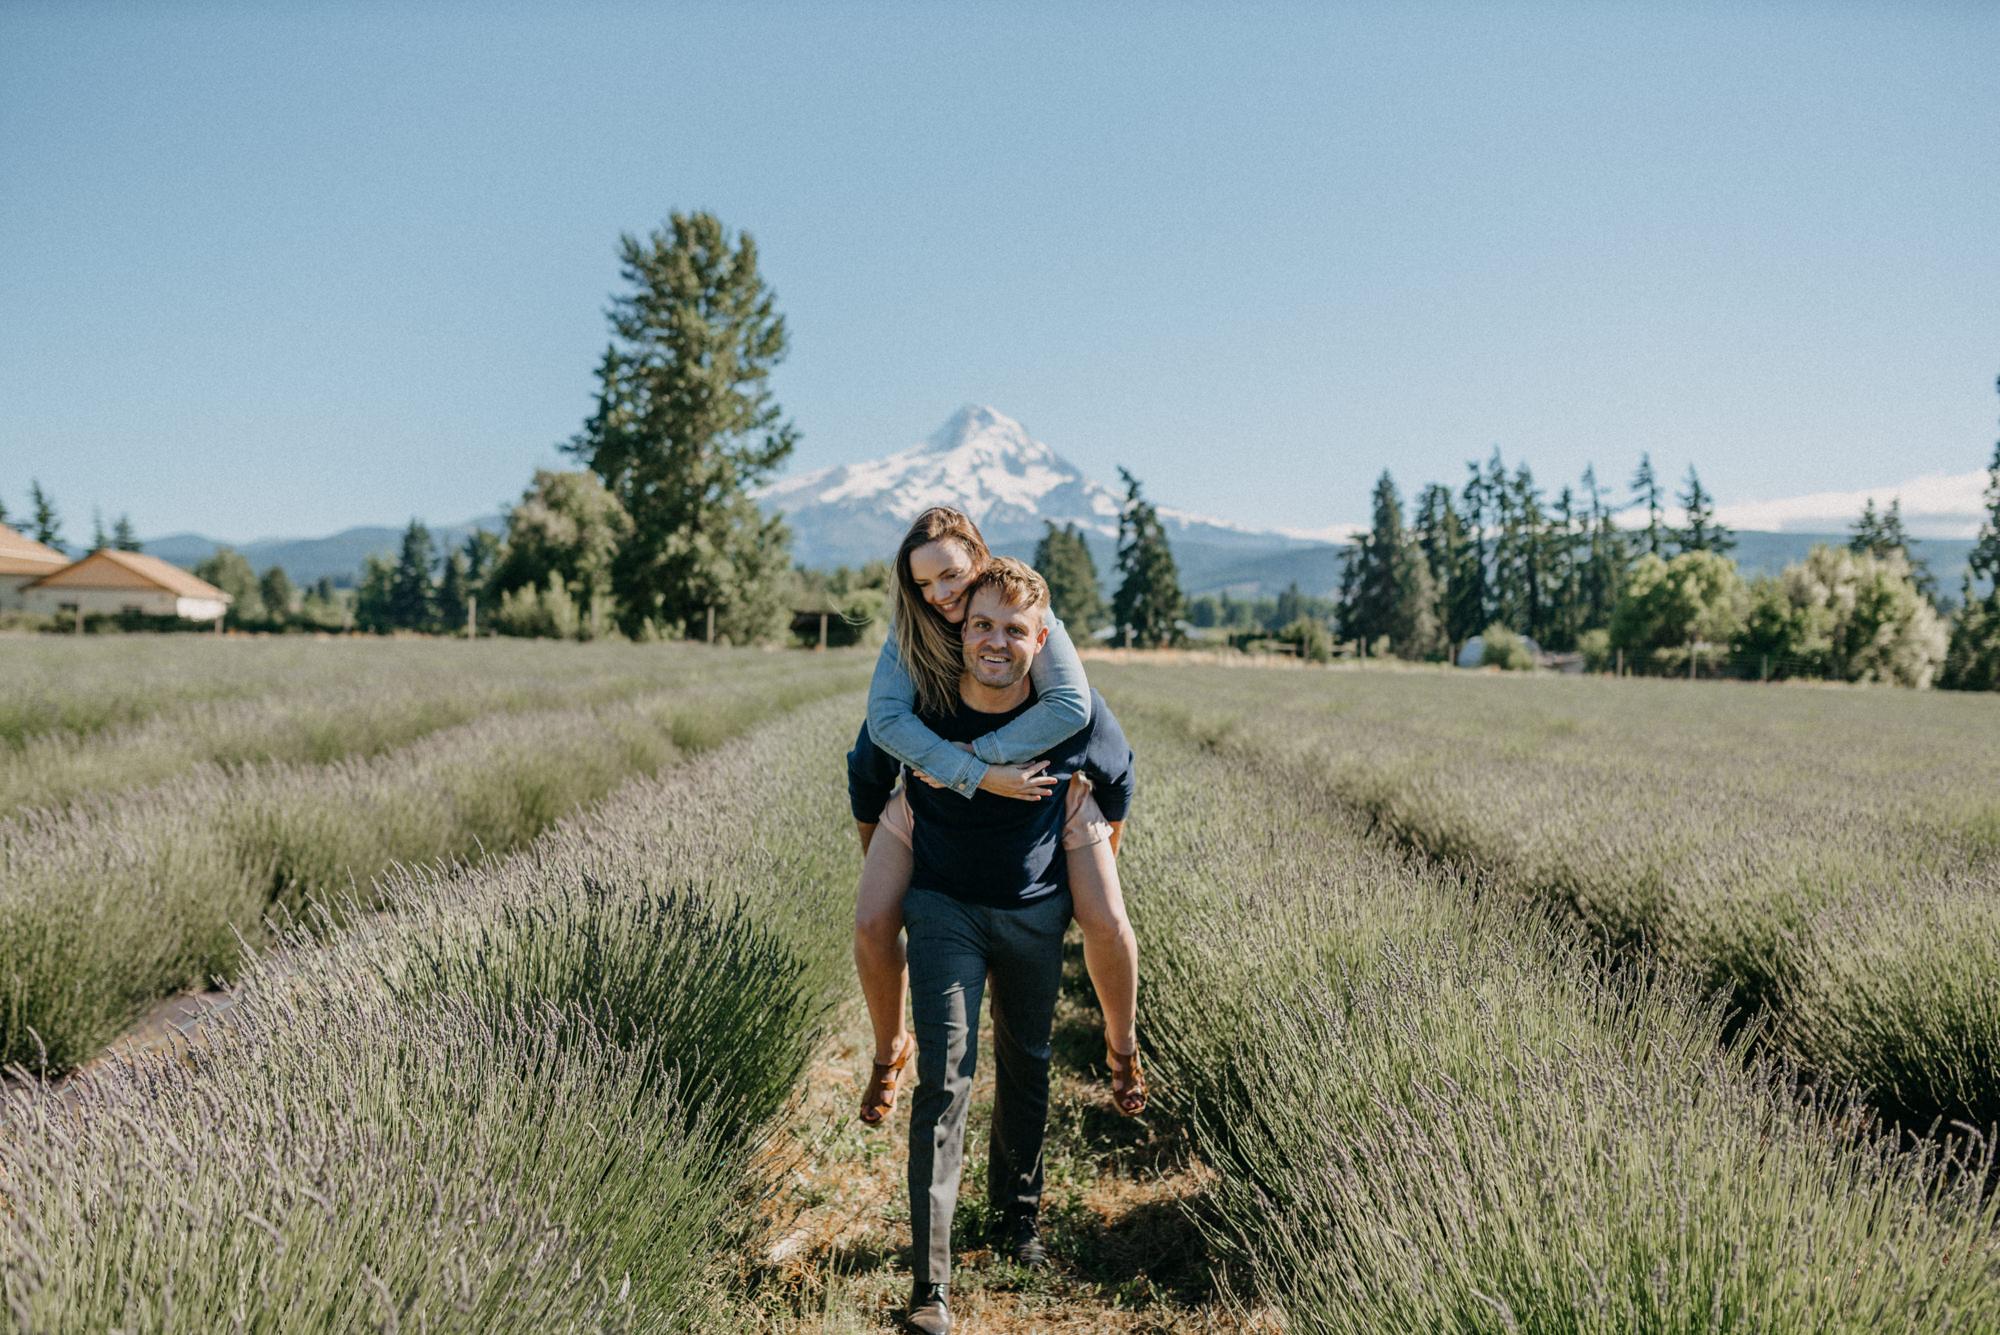 31-Mt-hood-lavender-farms-engagment-couple-summer-7809.jpg